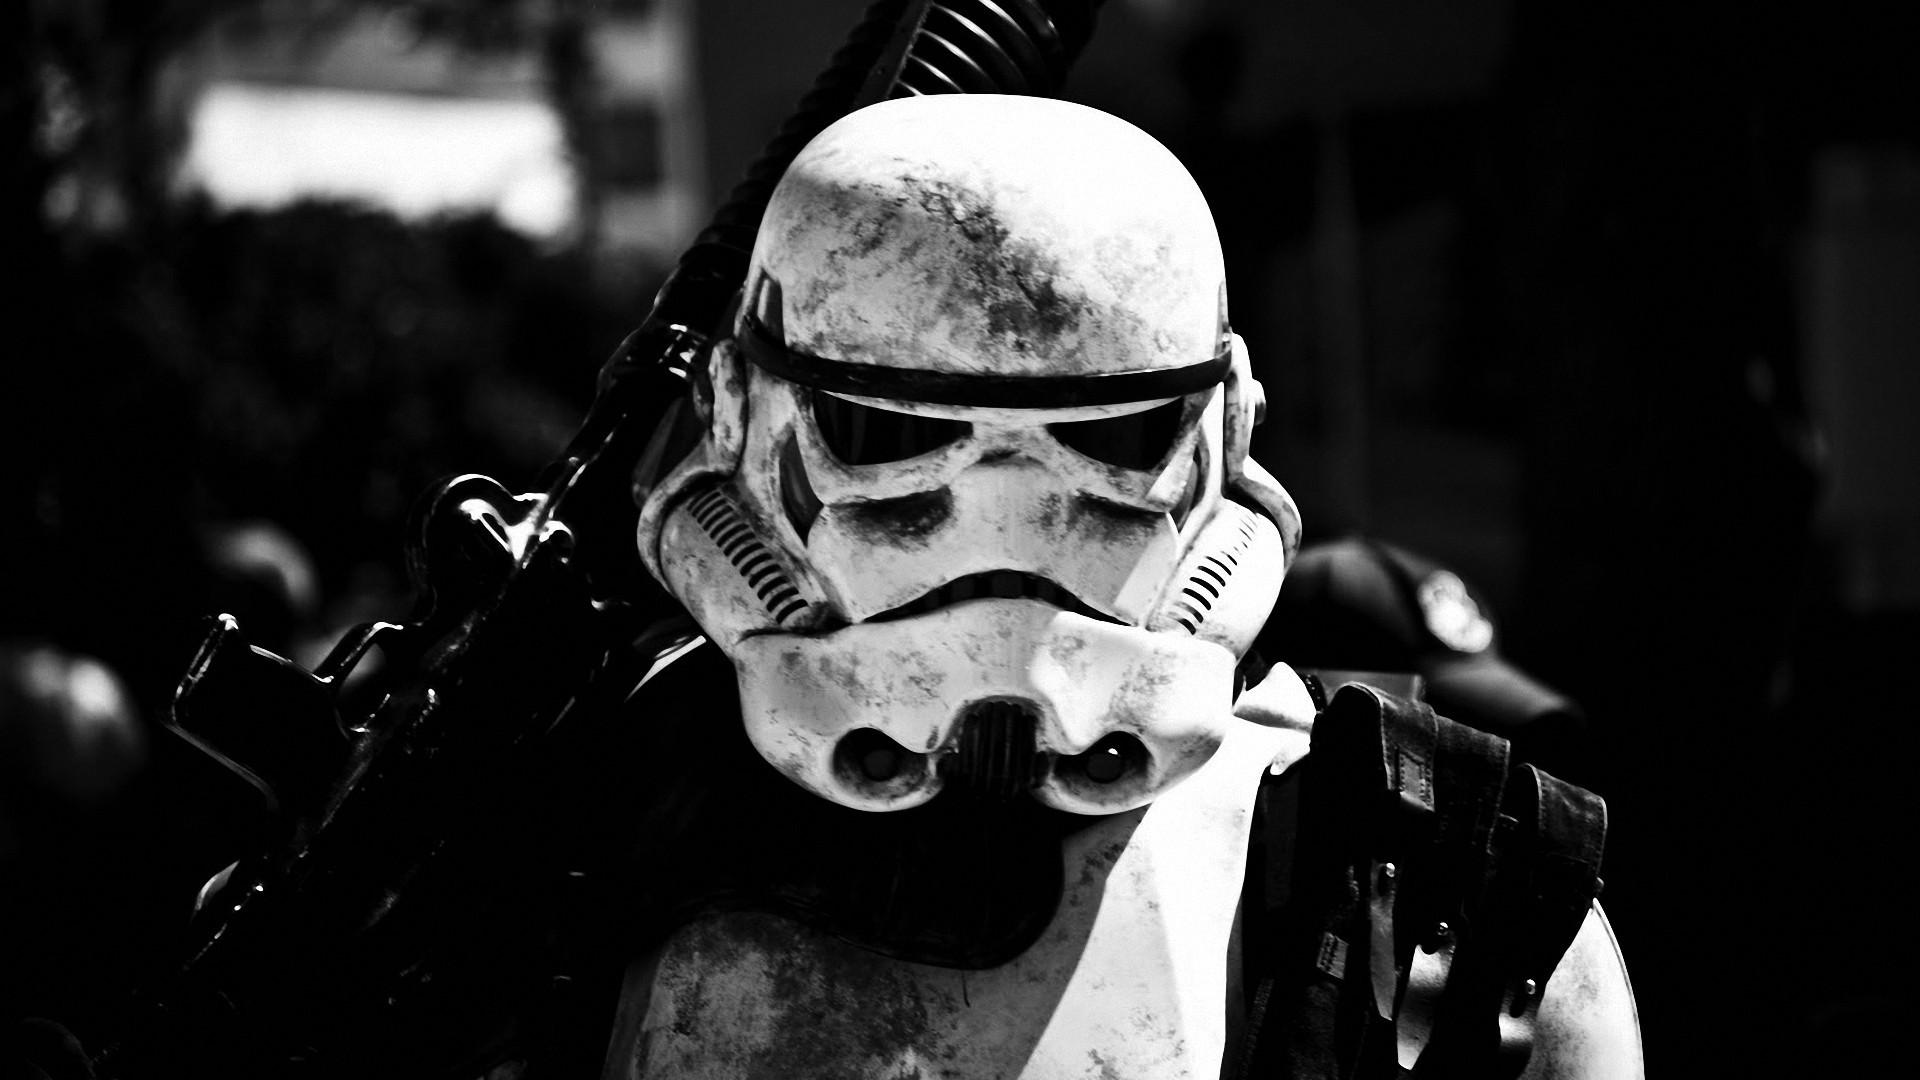 Star Wars Stormtrooper Wallpaper Wallpapertag